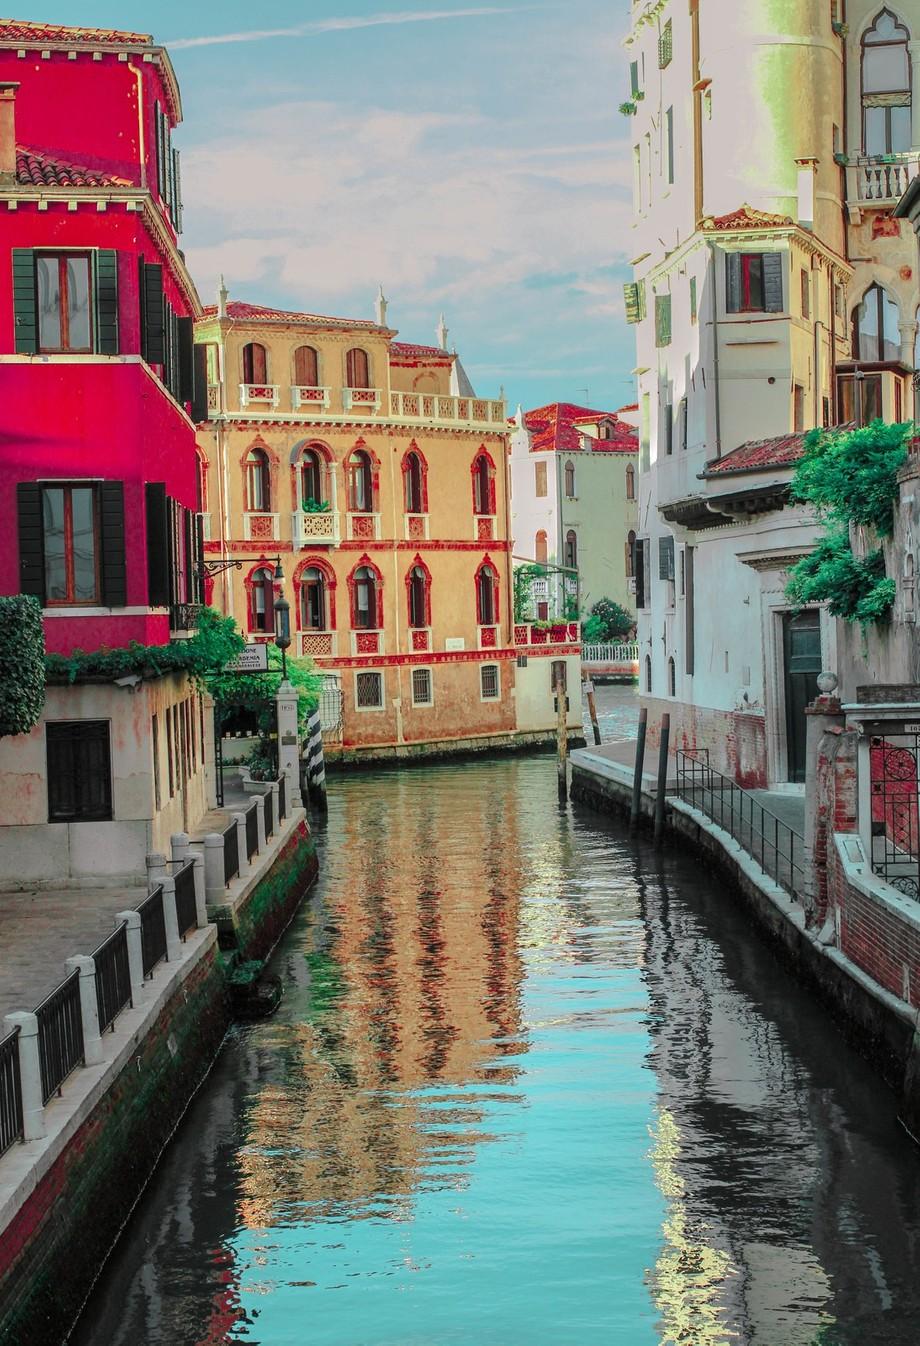 A secluded neighborhood in Venice